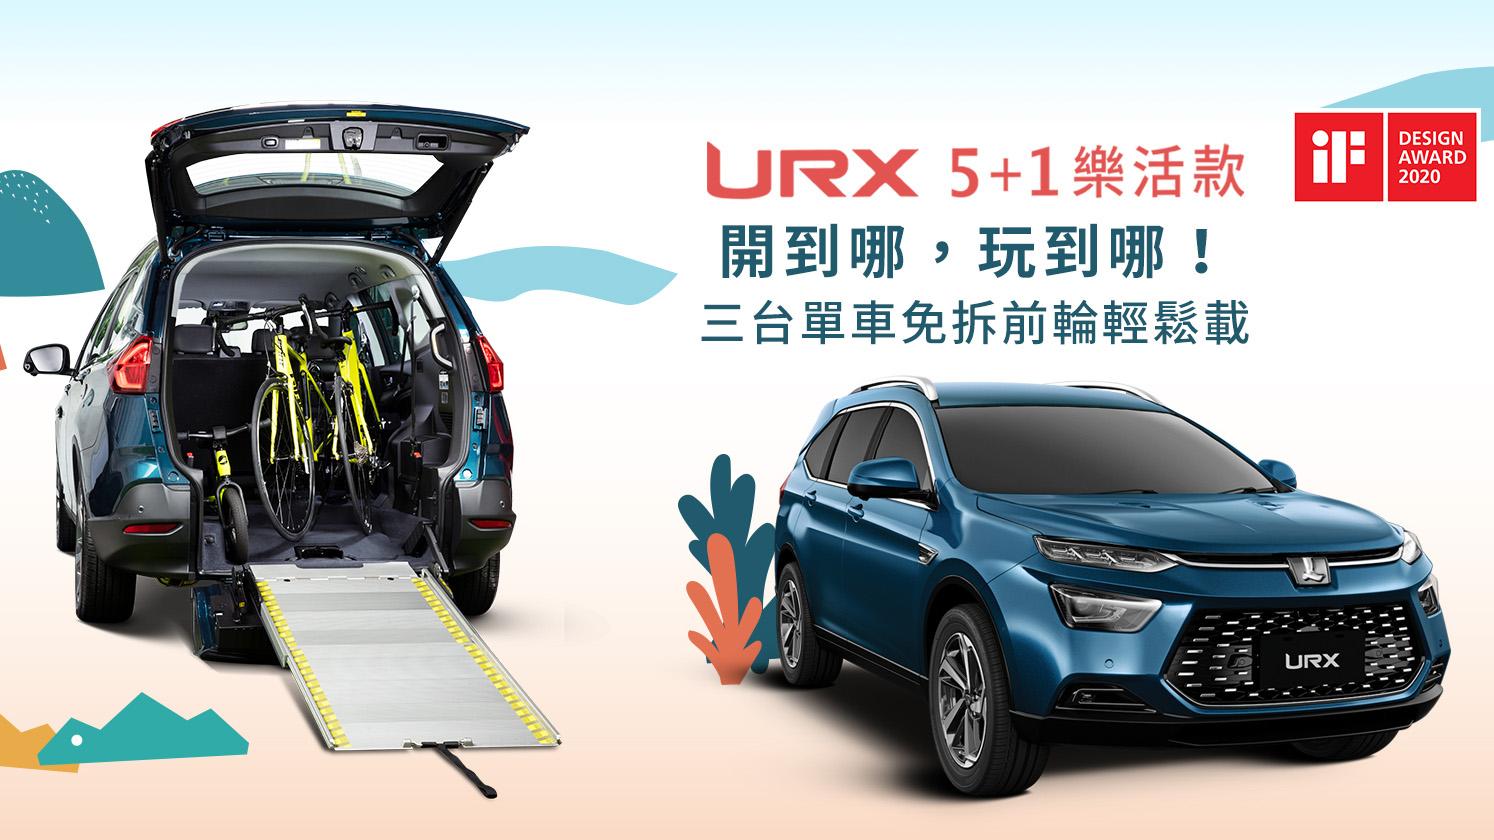 Luxgen 囊括國內外設計大獎,URX 再獲 2020 金點設計獎